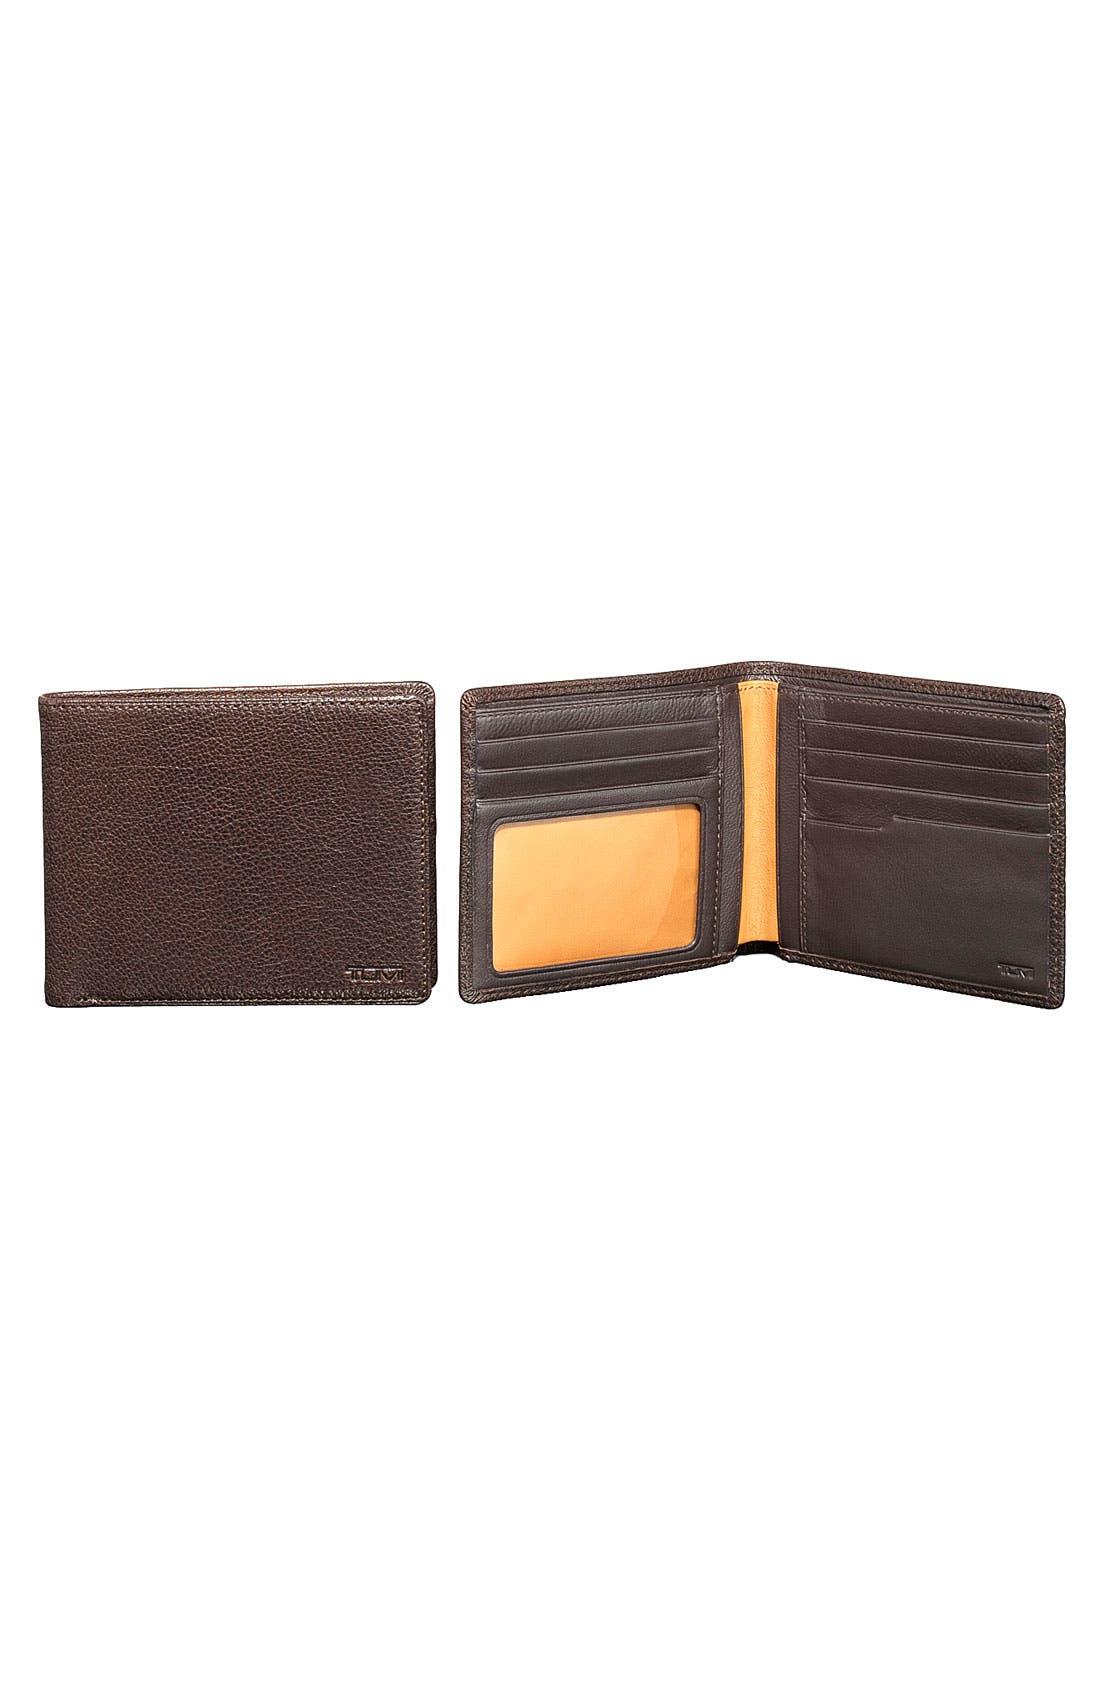 Alternate Image 1 Selected - Tumi 'Sierra - Global' Double Billfold ID Wallet